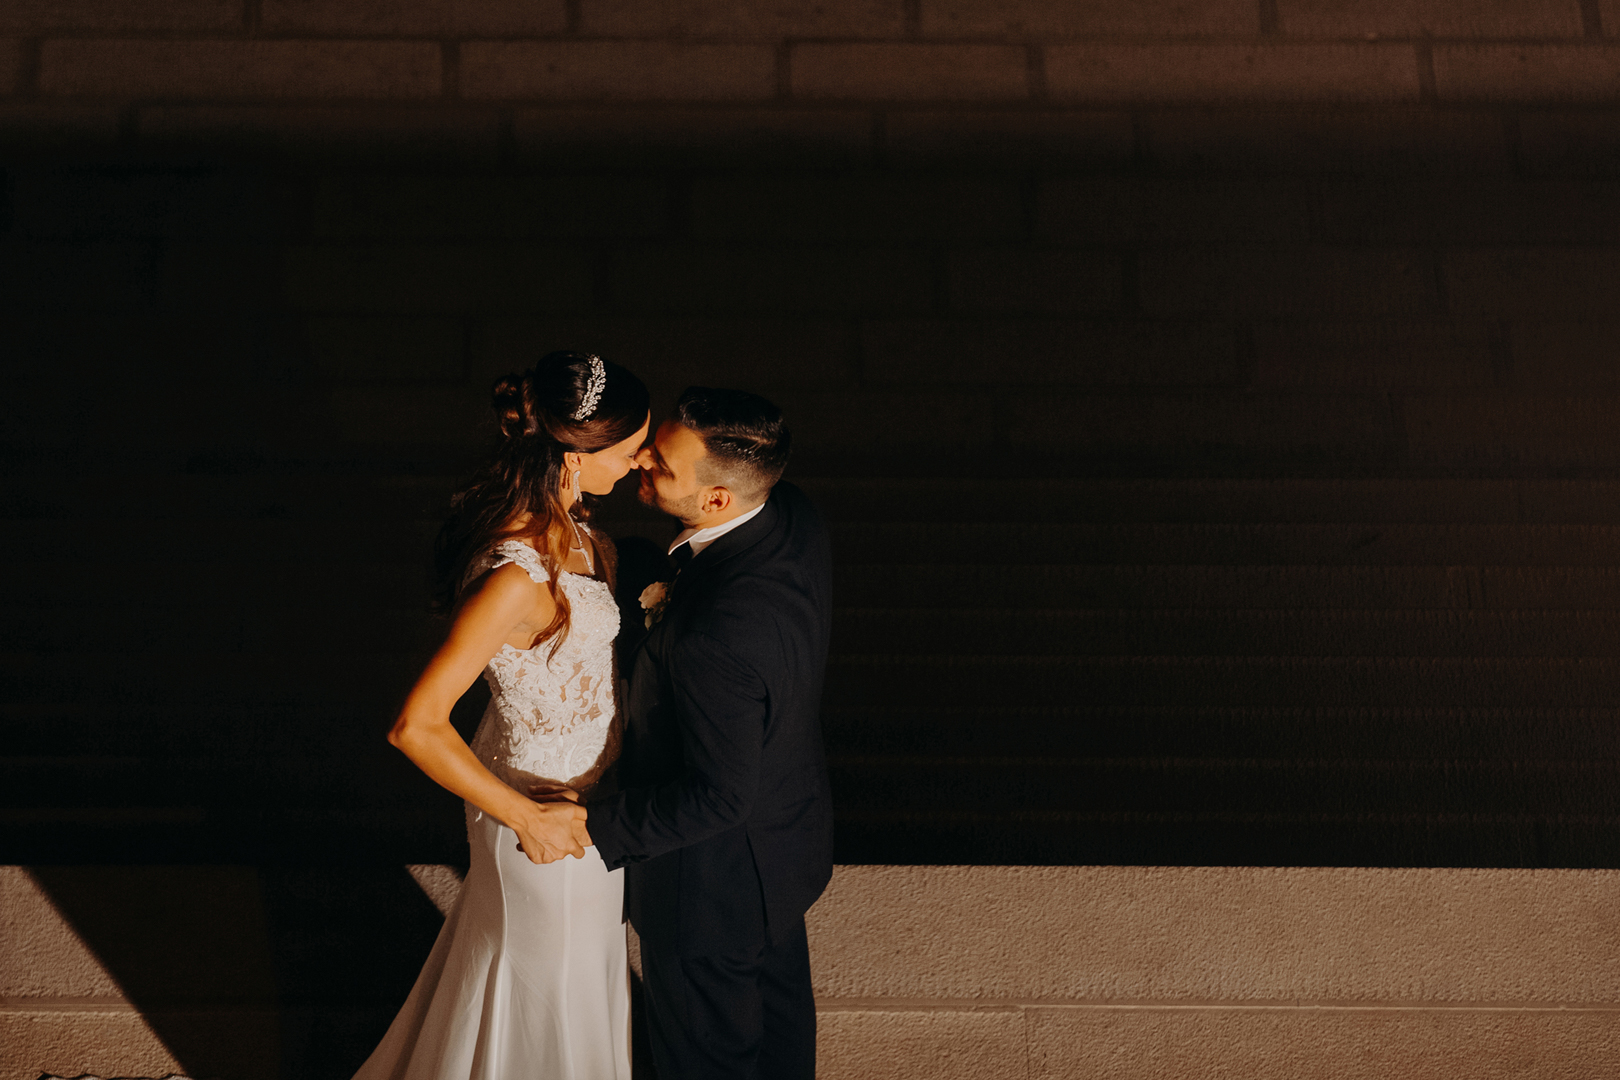 41 gianni-lepore-fotografo-sposi-matrimonio-molfetta